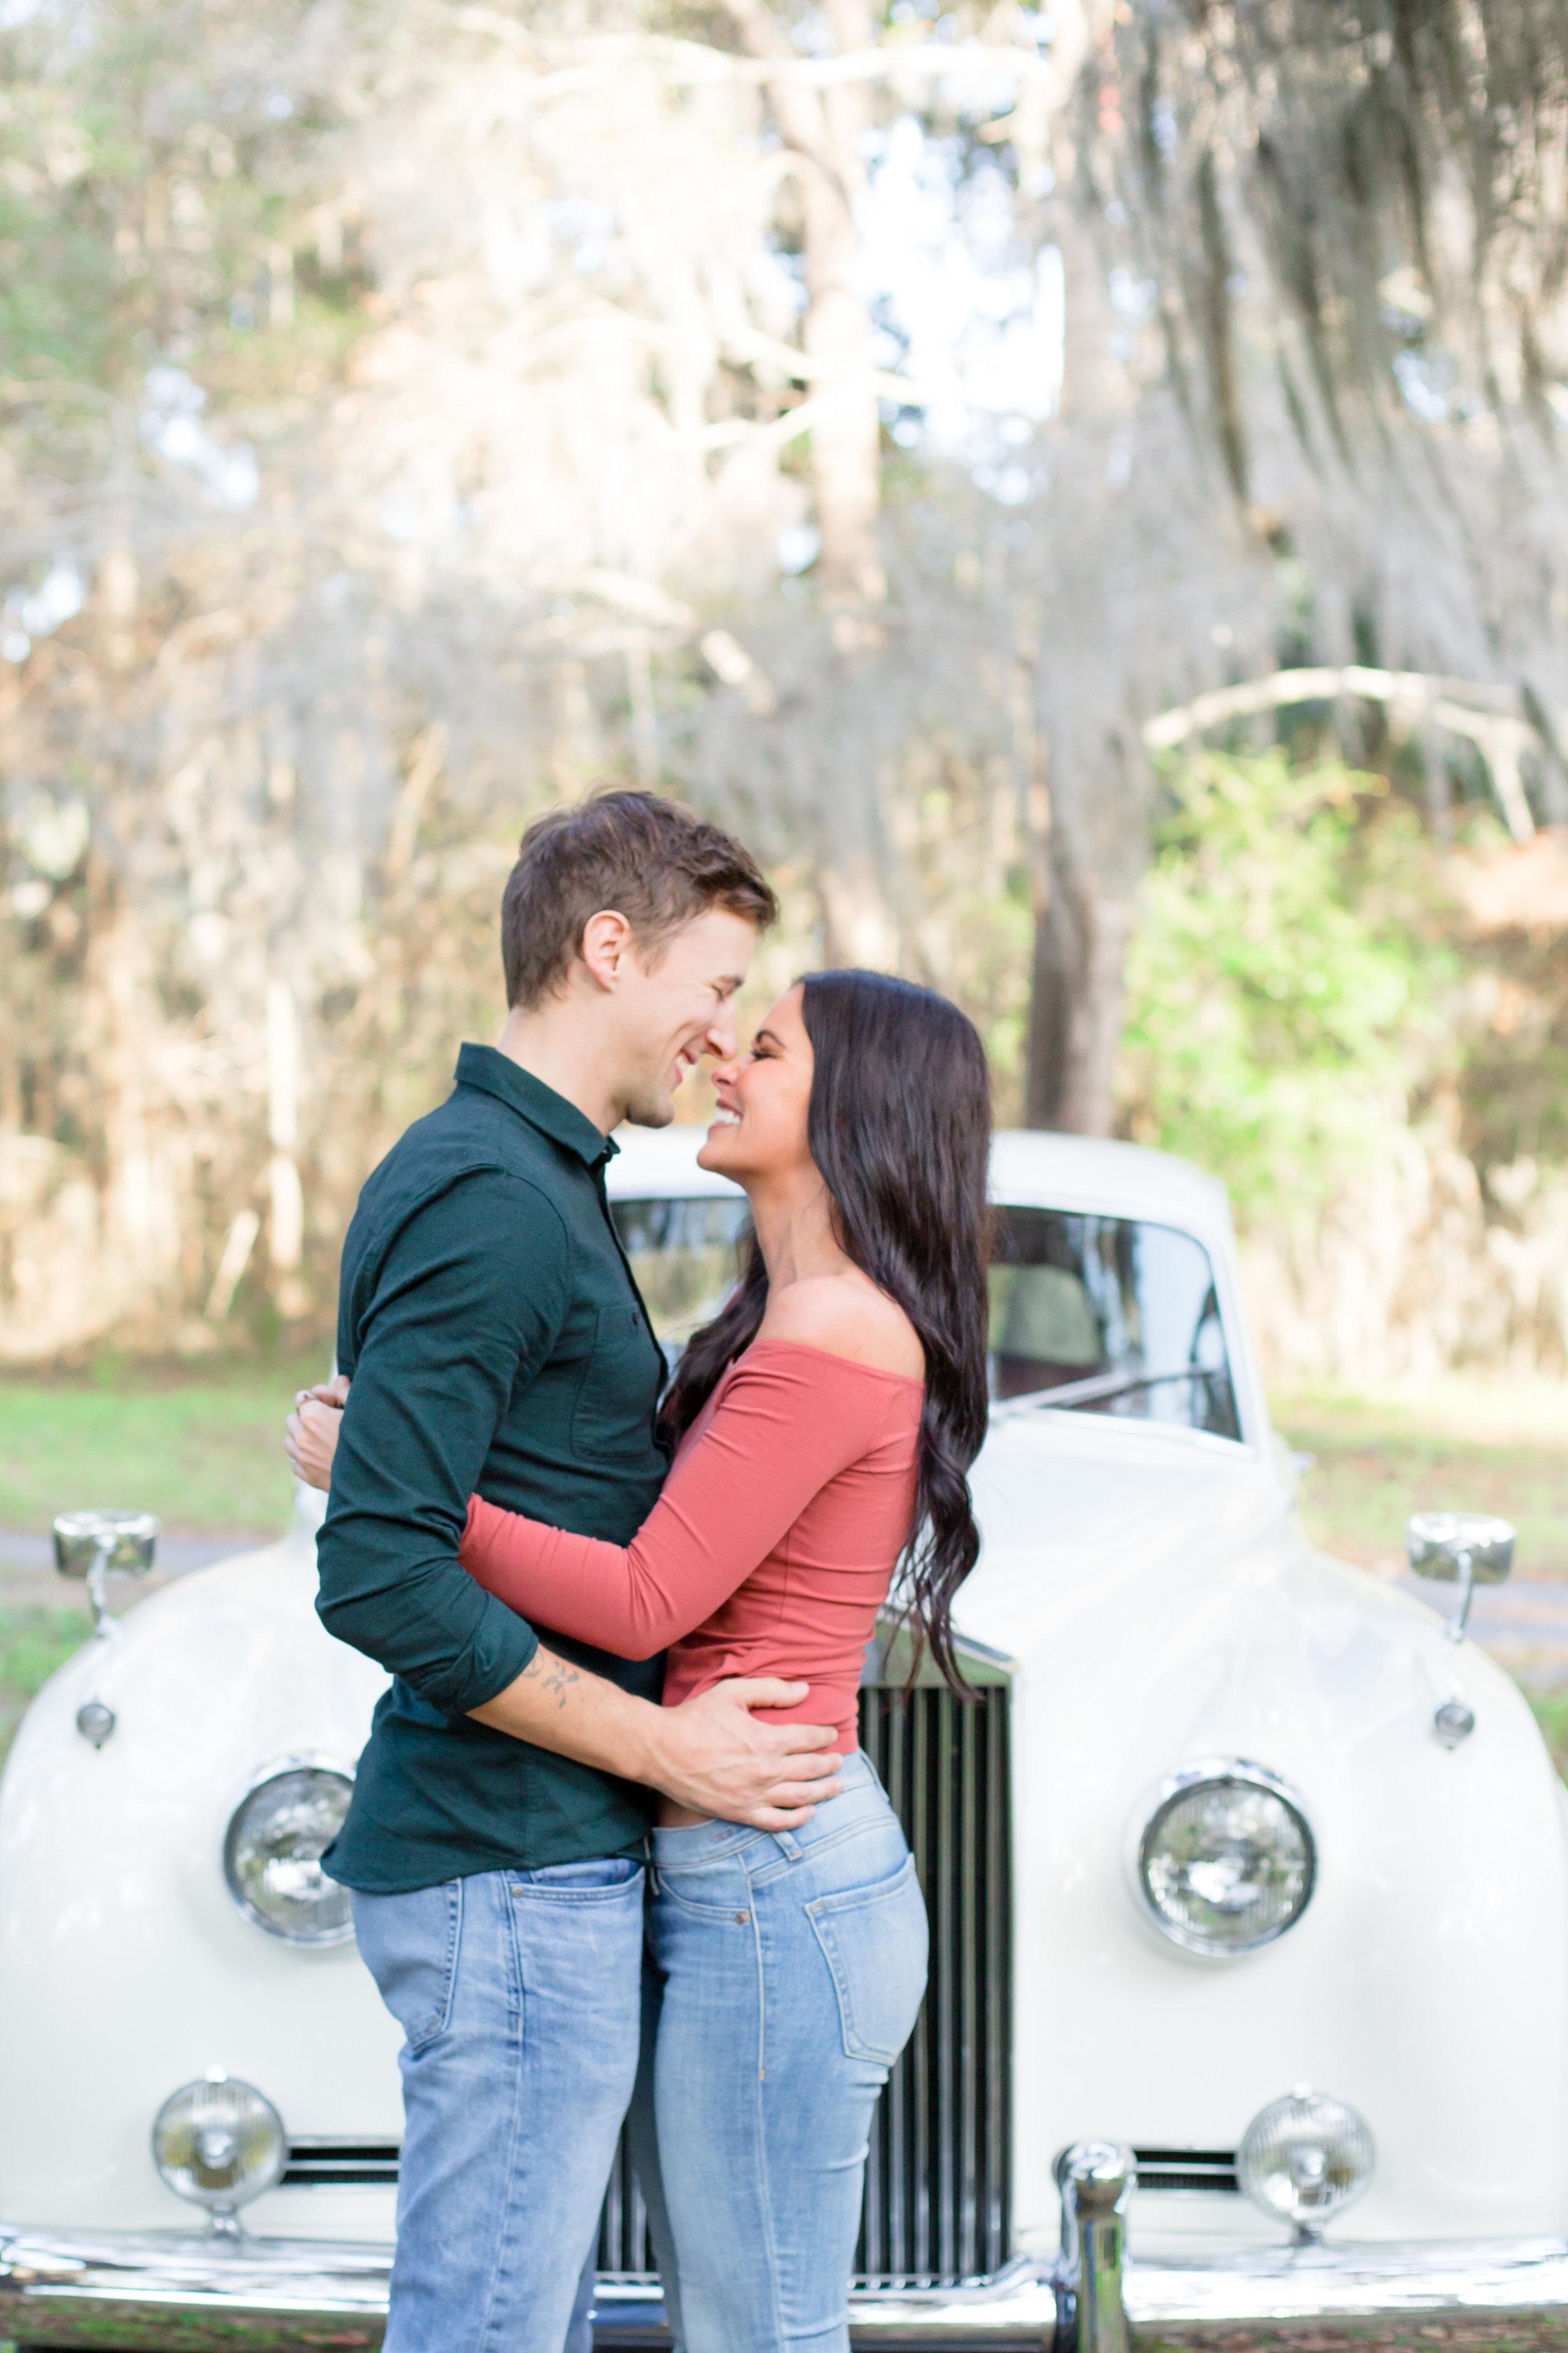 kailee-dimeglio-charleston-engagement-vintage-car